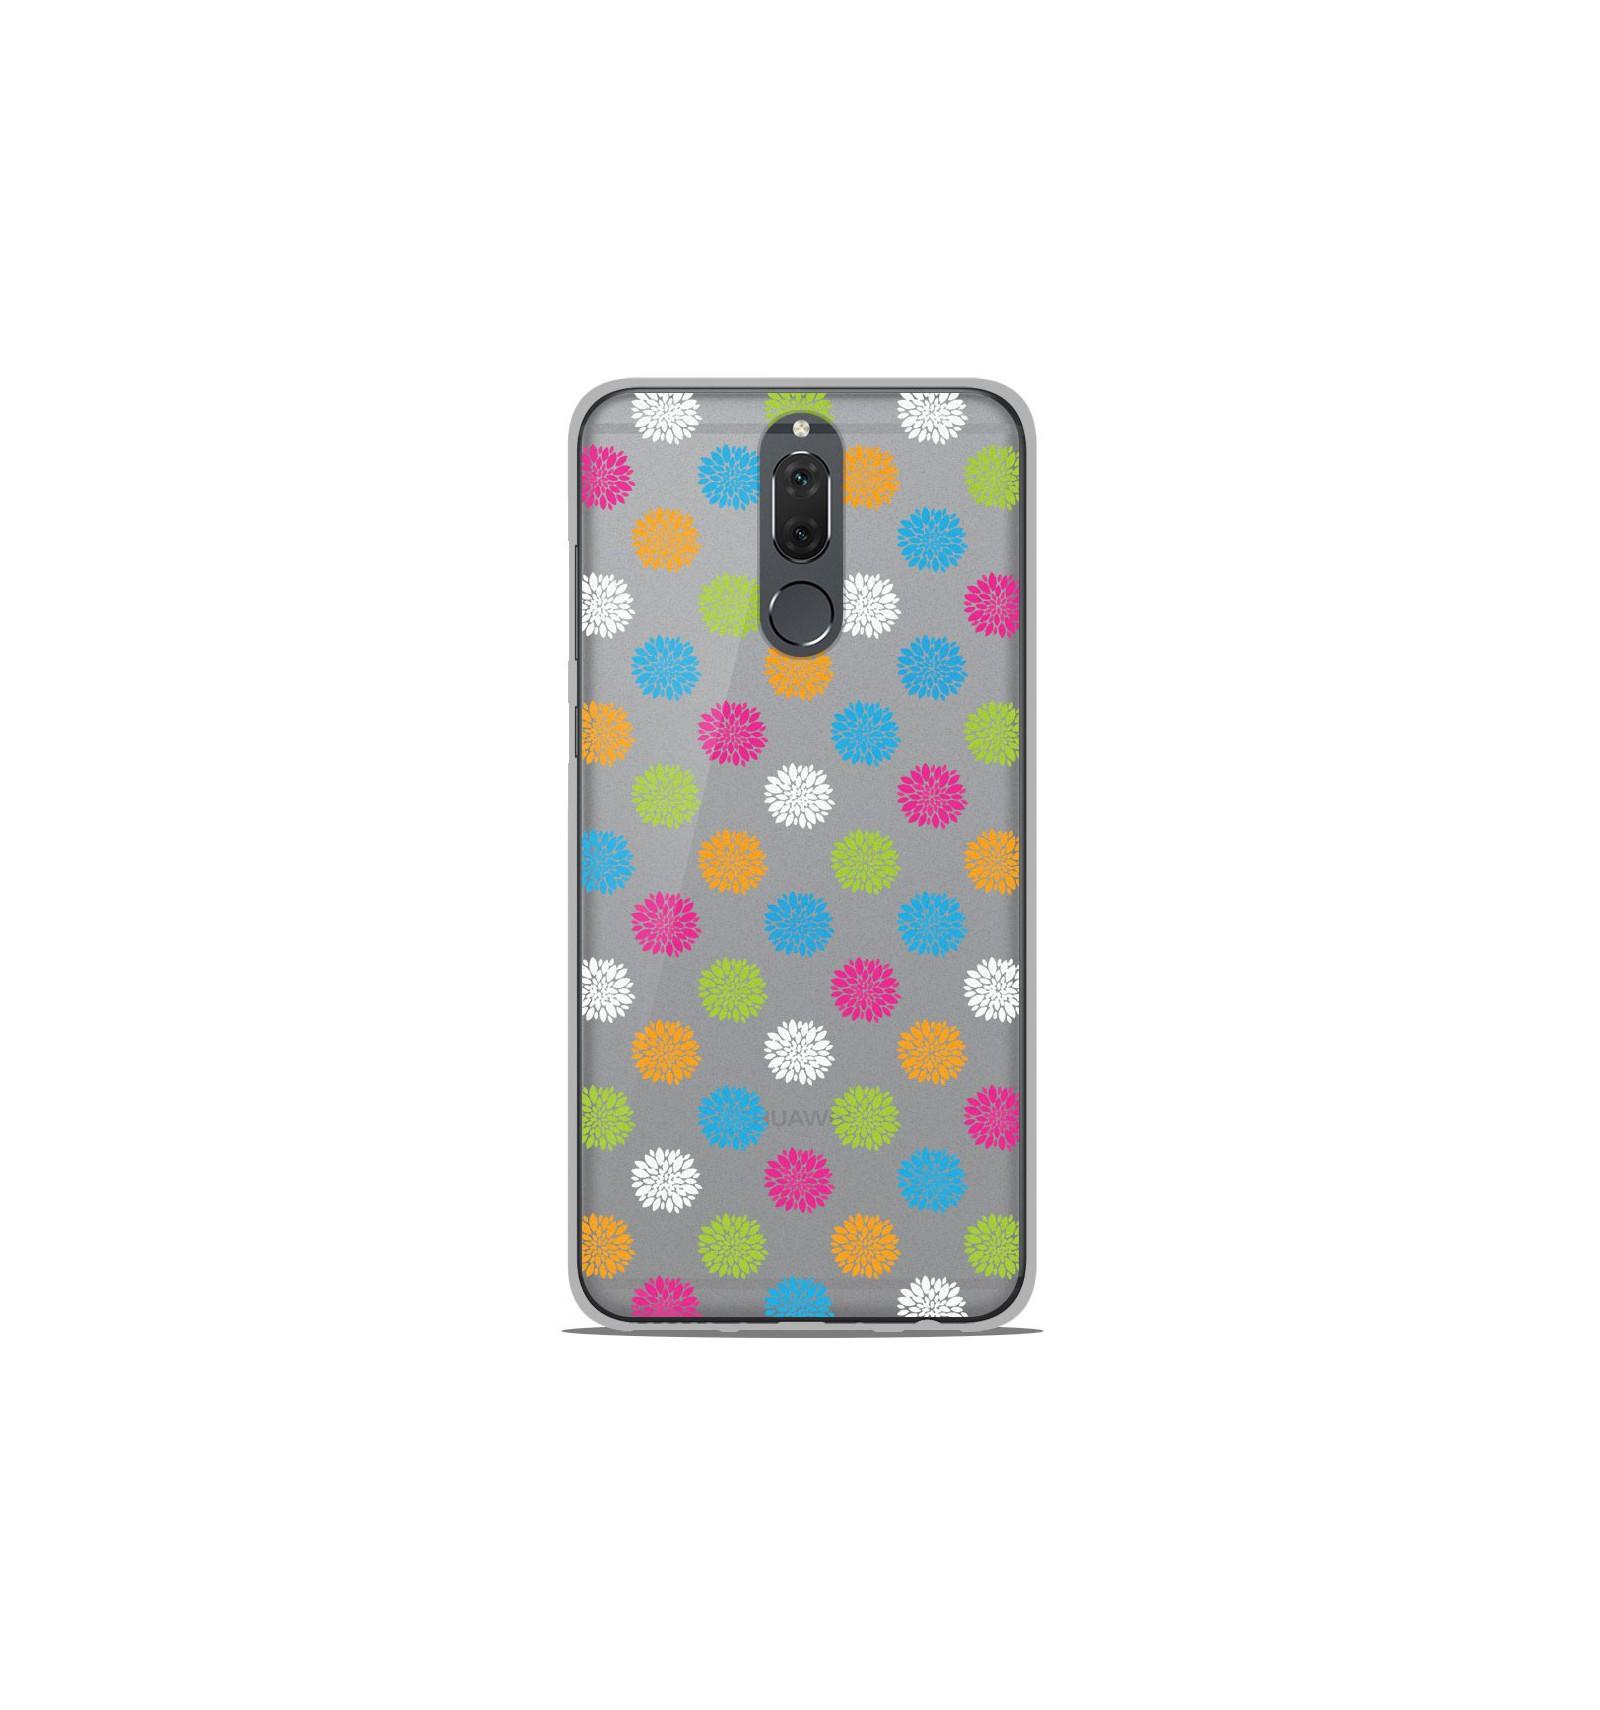 Coque en silicone Huawei Mate 10 Lite - Floral